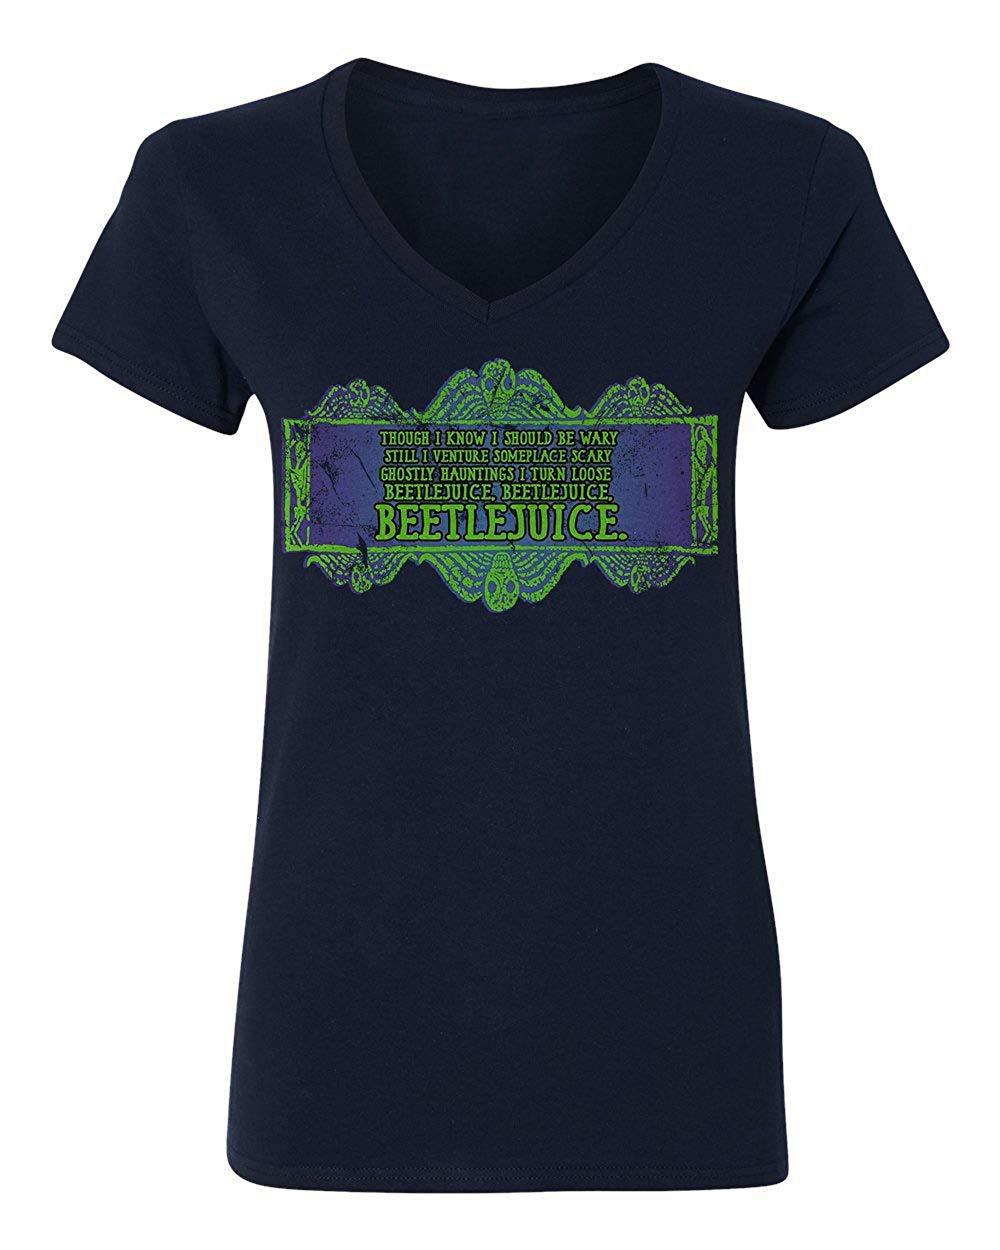 Shirt Horror Movie Novelty Tee Beetlejuice Vneck Tshirt